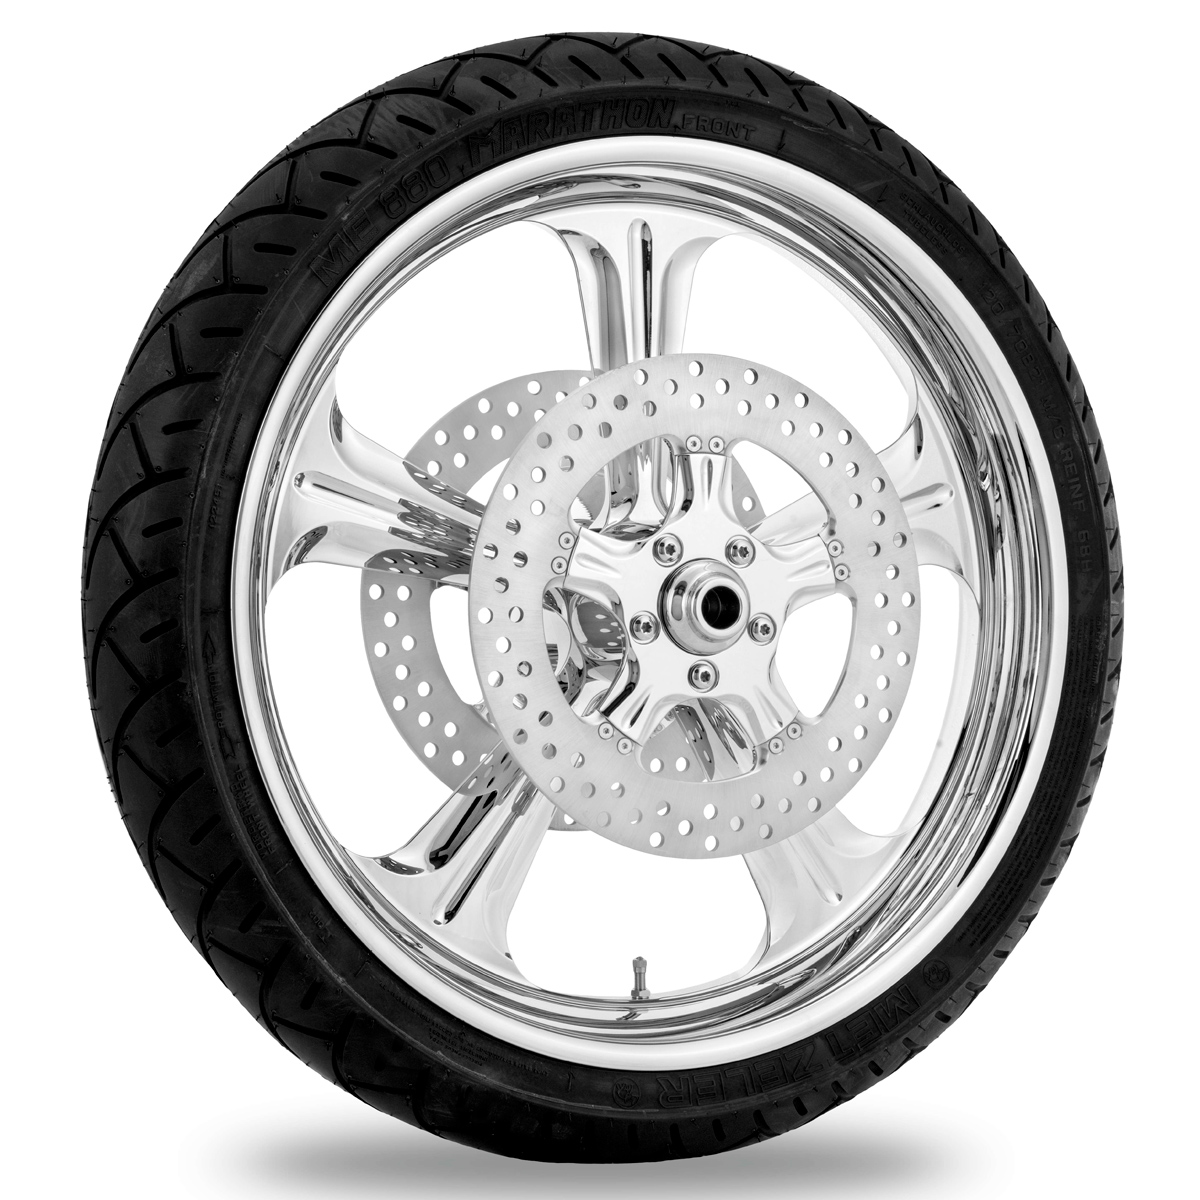 Performance Machine Wrath Chrome Front Wheel 18x3.5 ABS